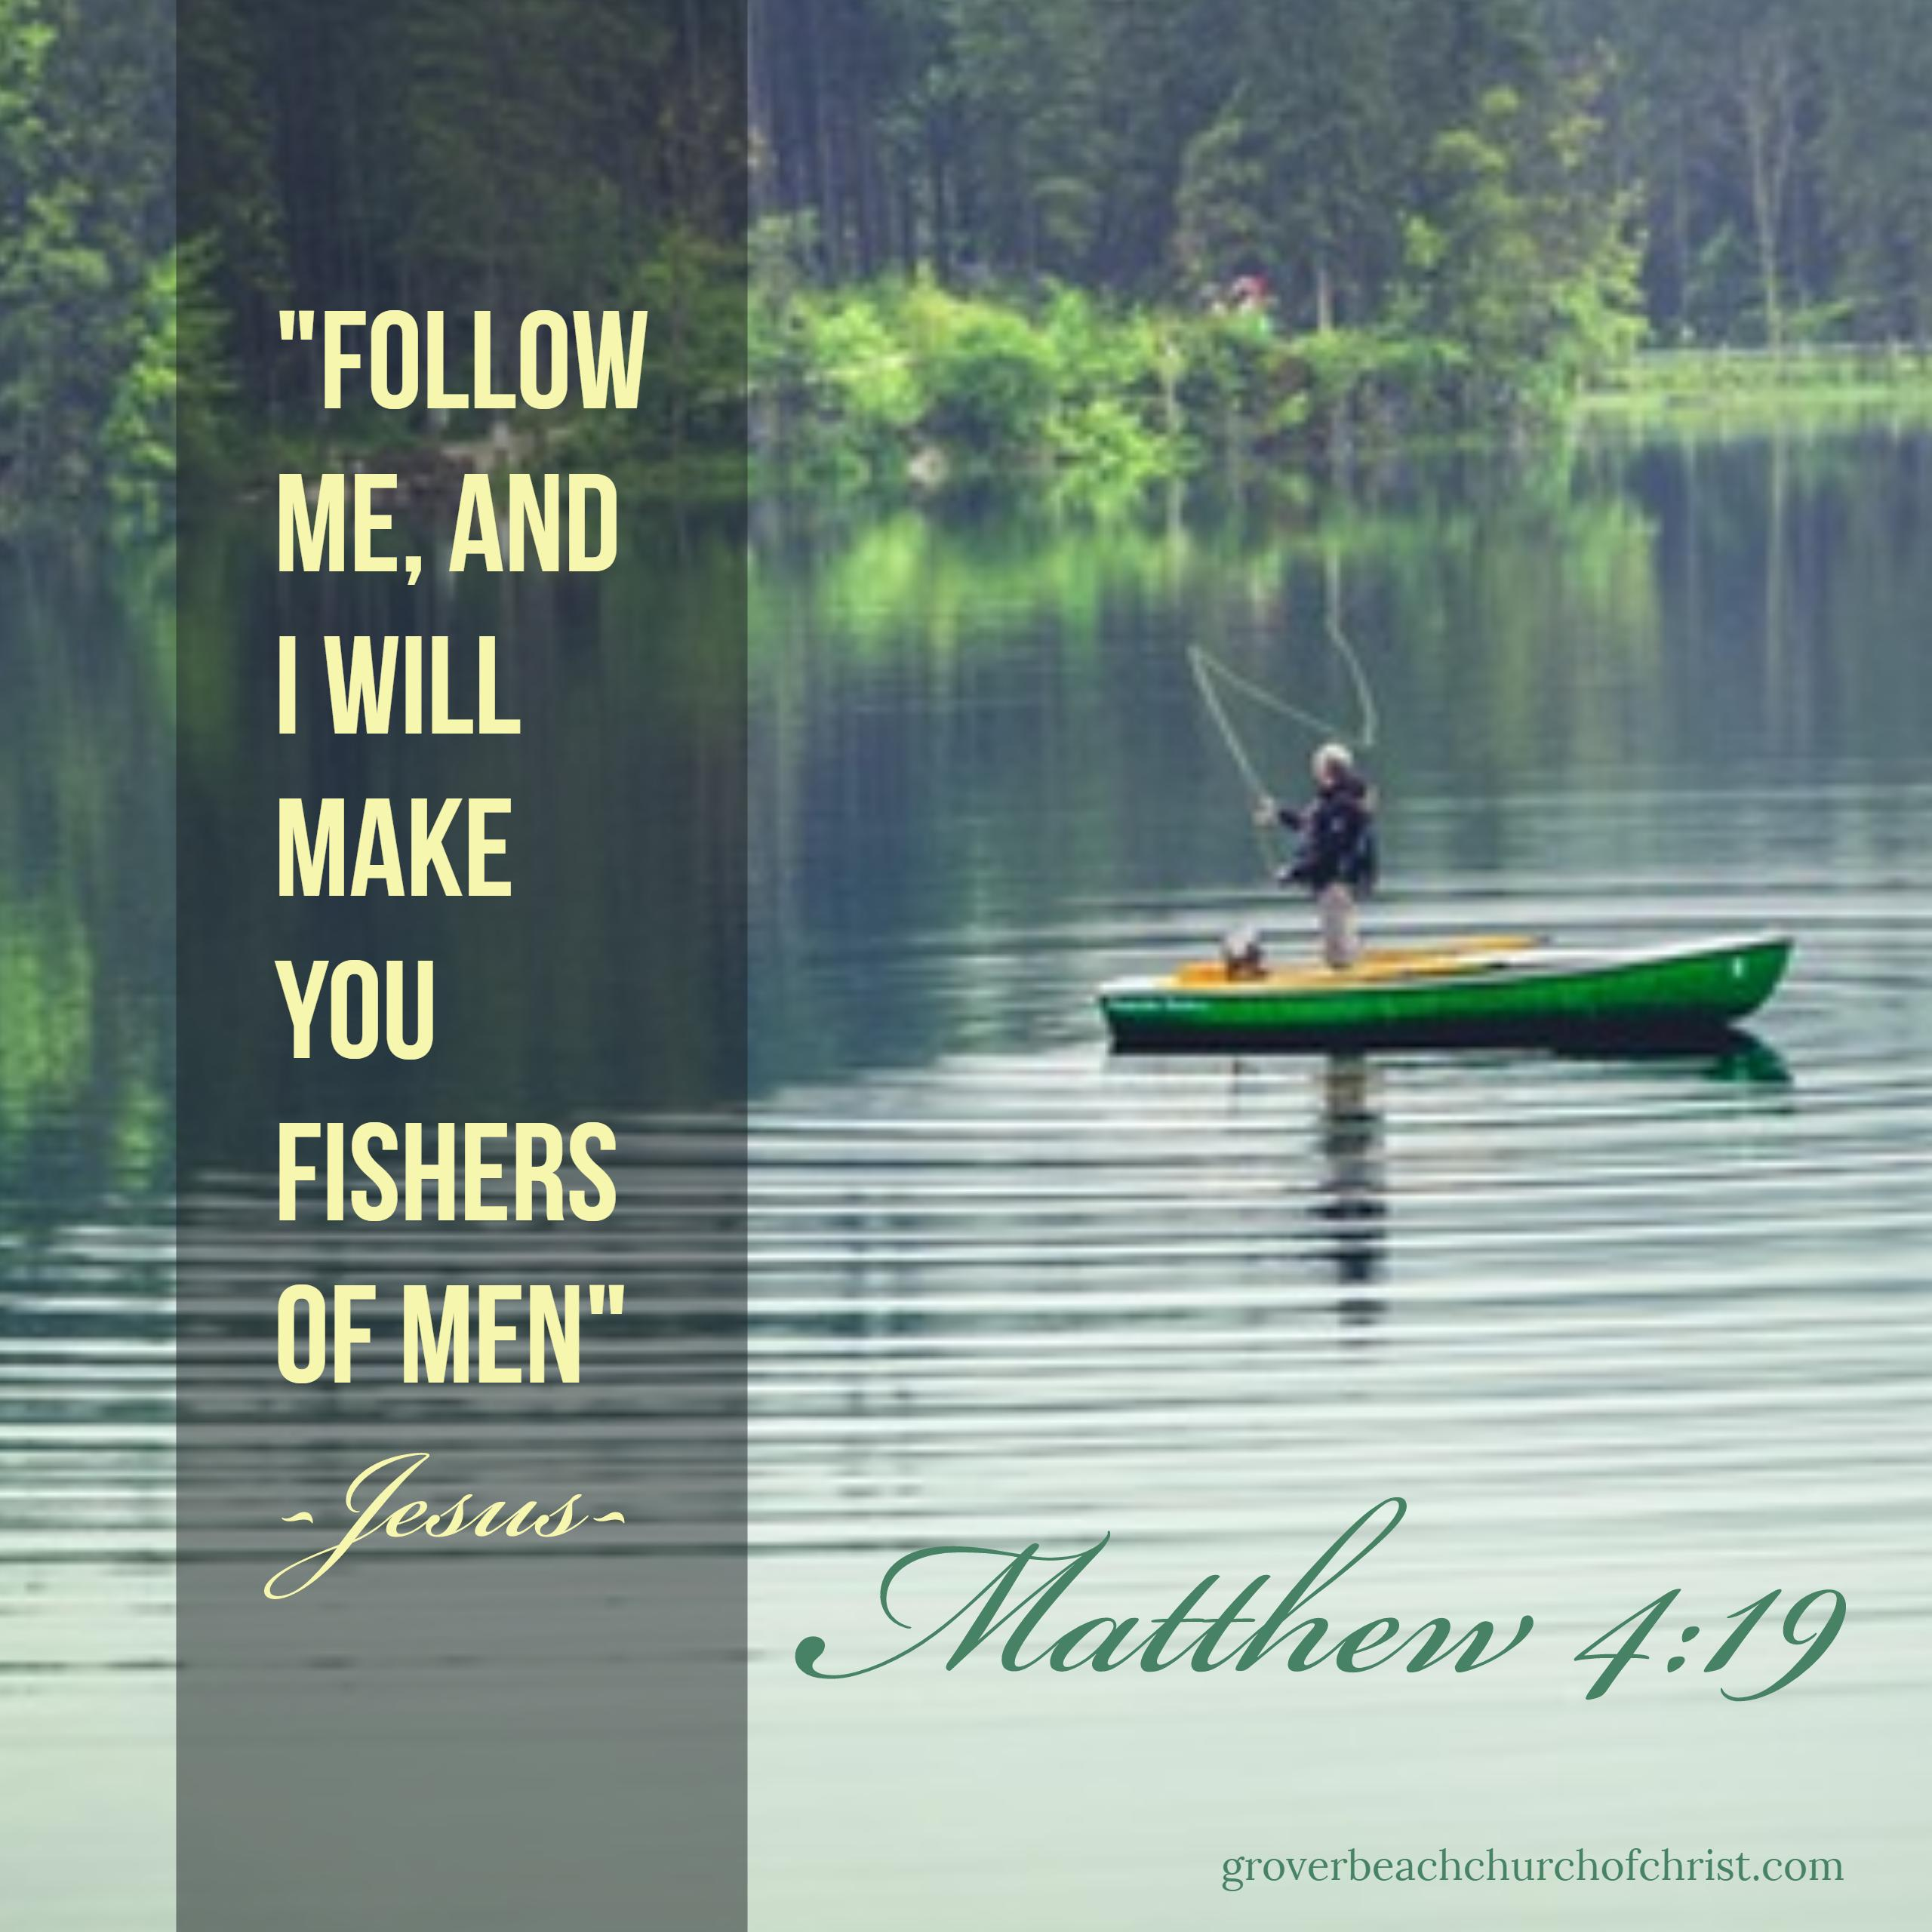 matthew-4-19-fishers-of-men